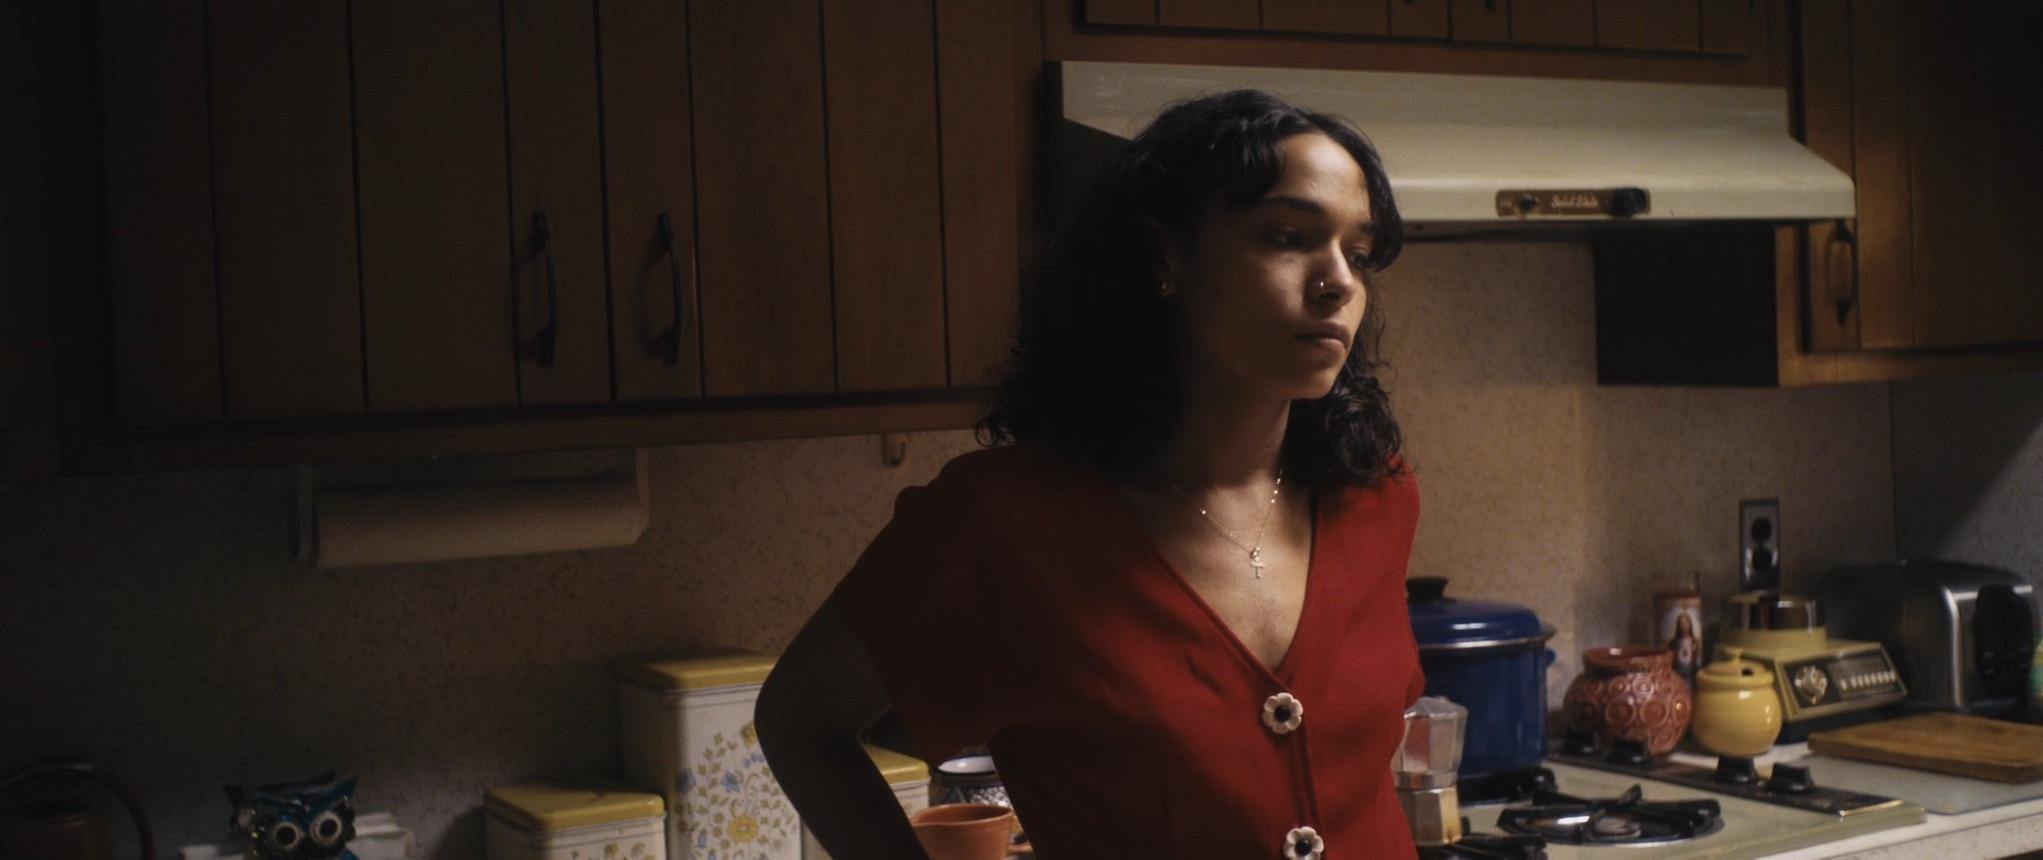 REVIEW: Princess Nokia Is Vulnerable & Flirty in Sensitive Romantic Drama 'Angelfish'